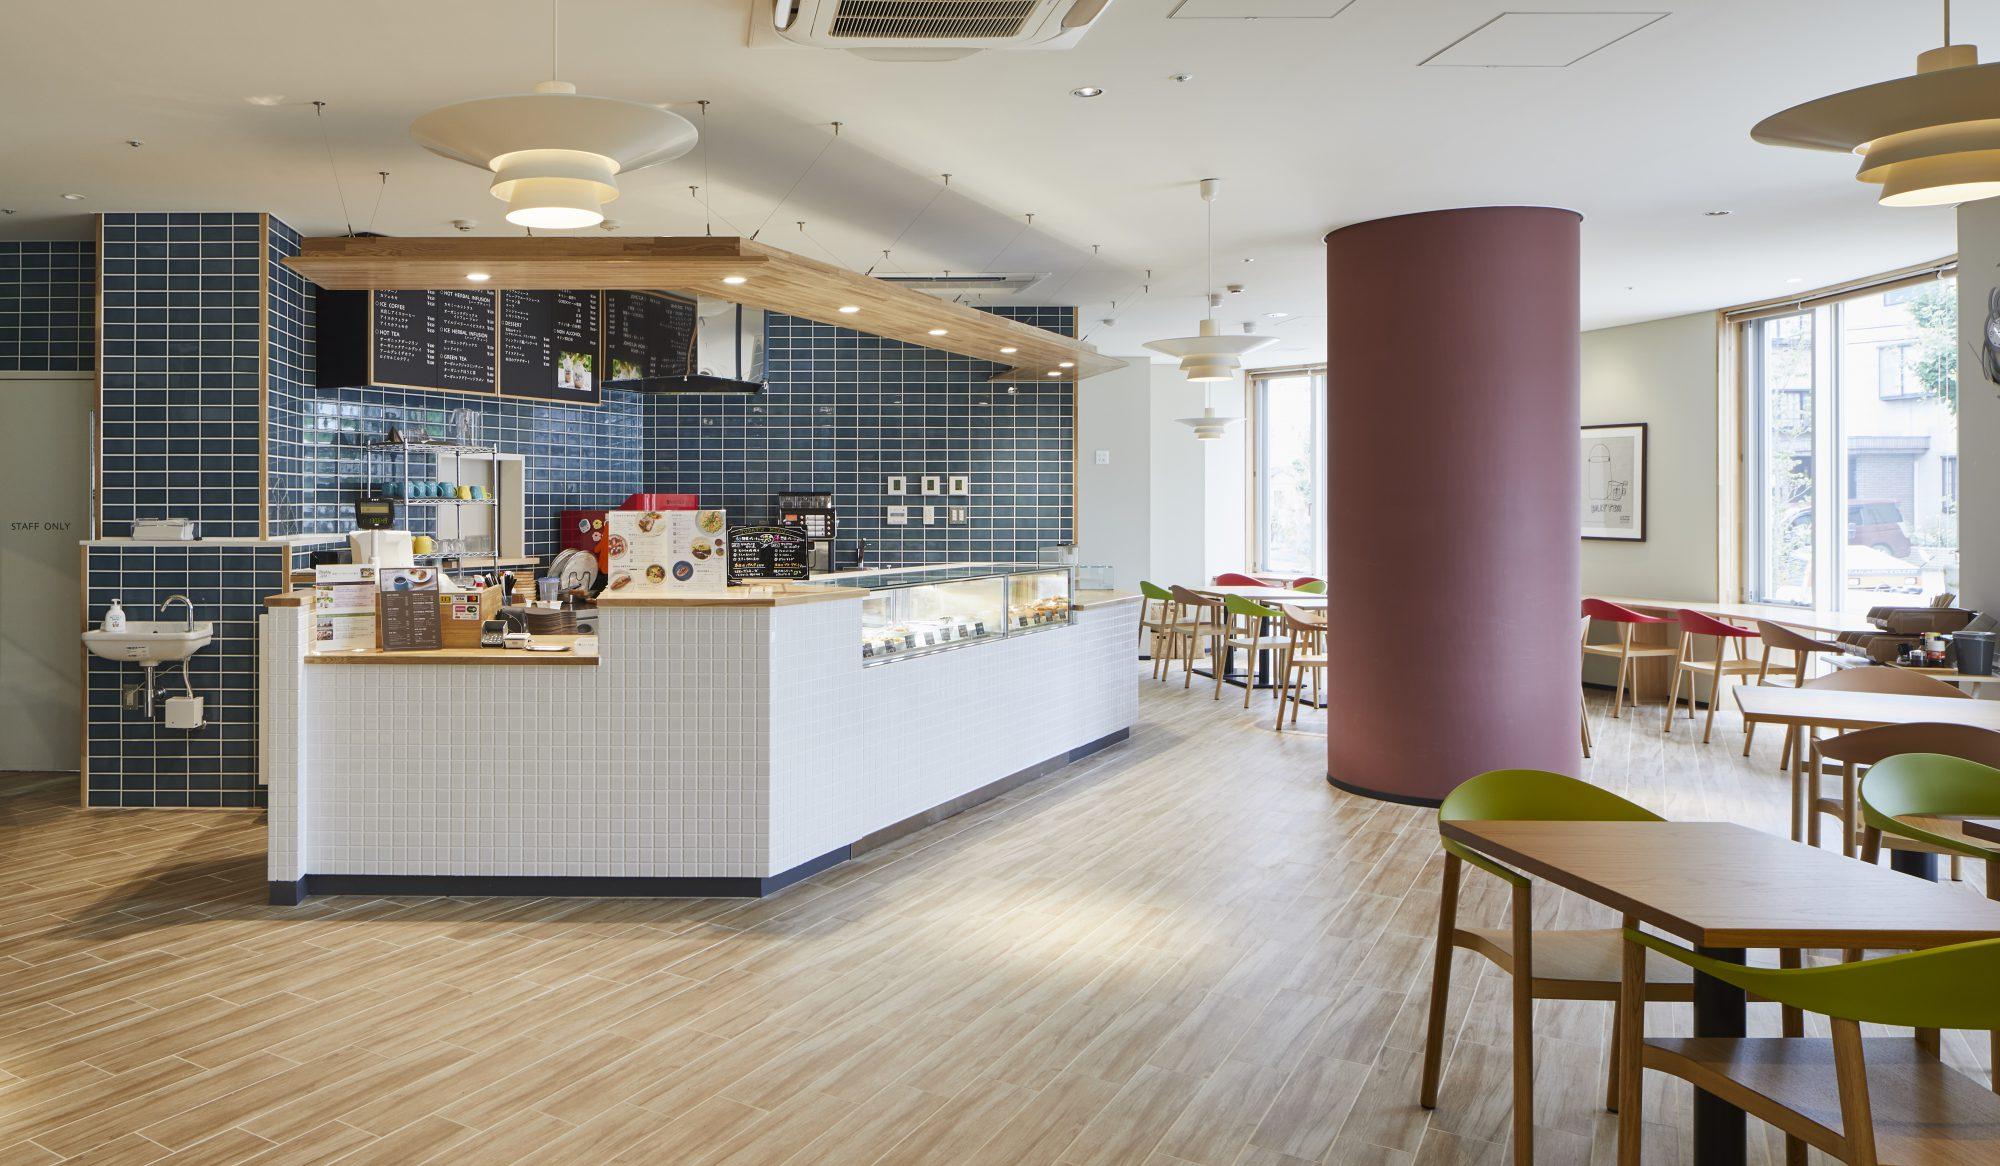 Rikasお惣菜とカフェ